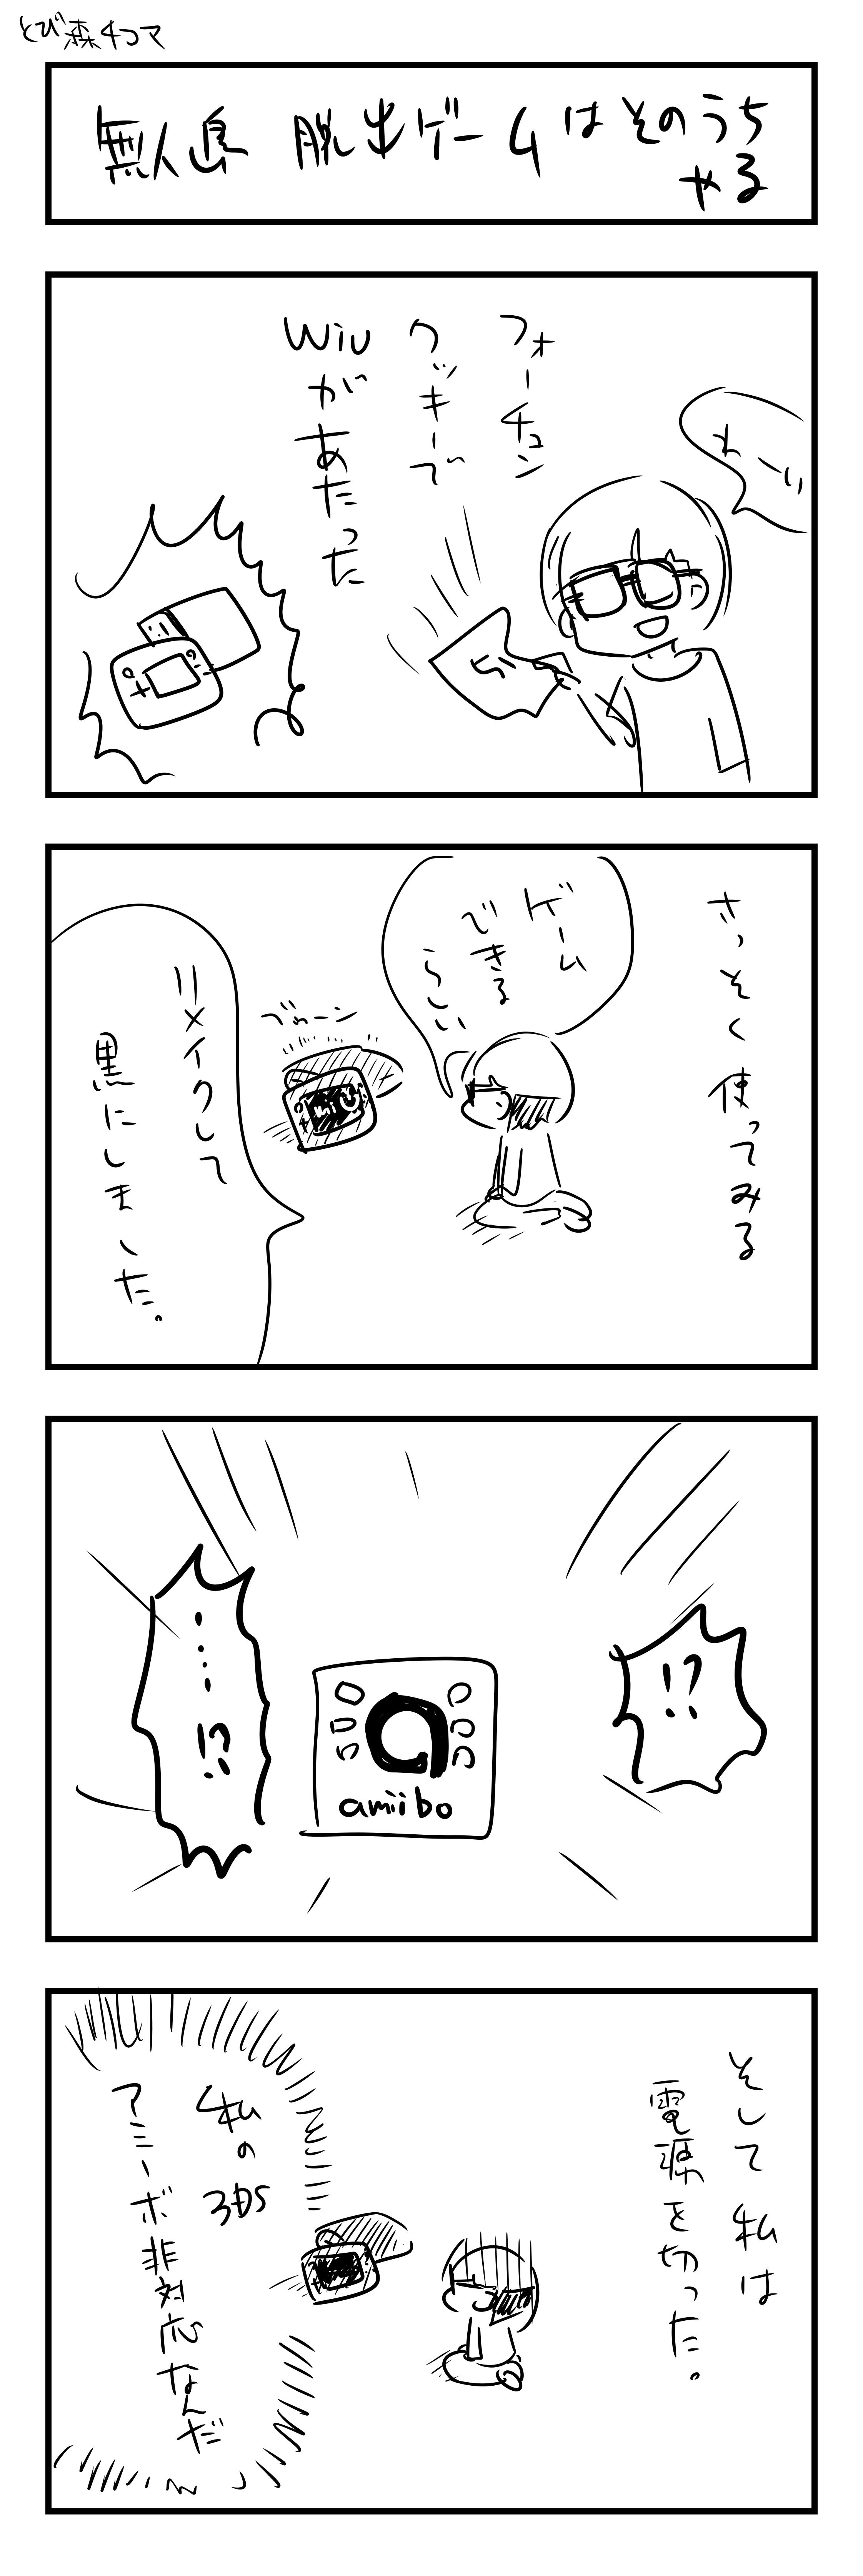 森4コマ Wiiu